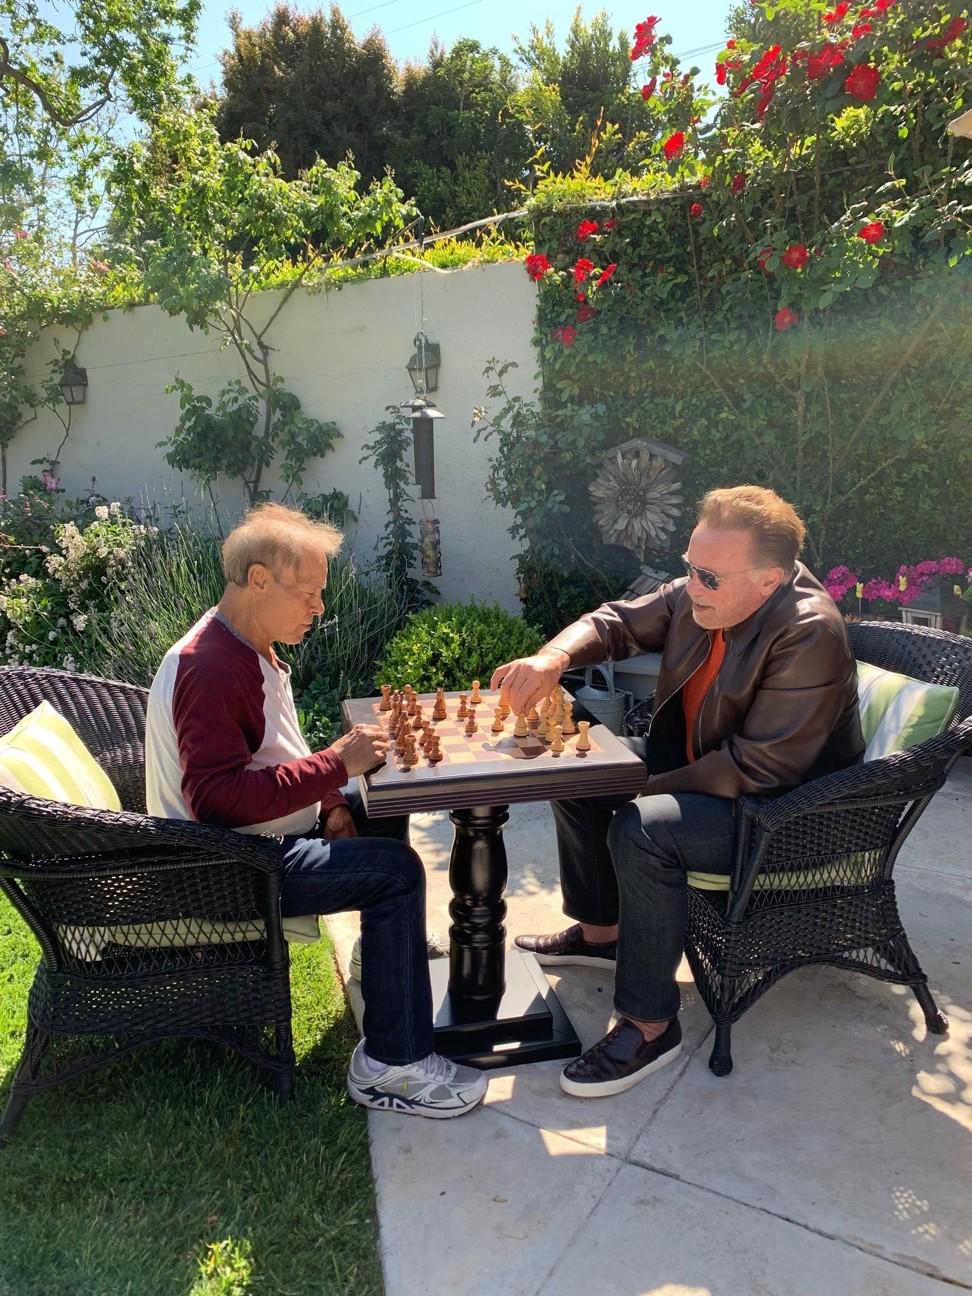 I will always miss you Franco: Arnold Schwarzenegger writes heartfelt tribute to his 'partner in crime' Franco Columbu who dies at 78